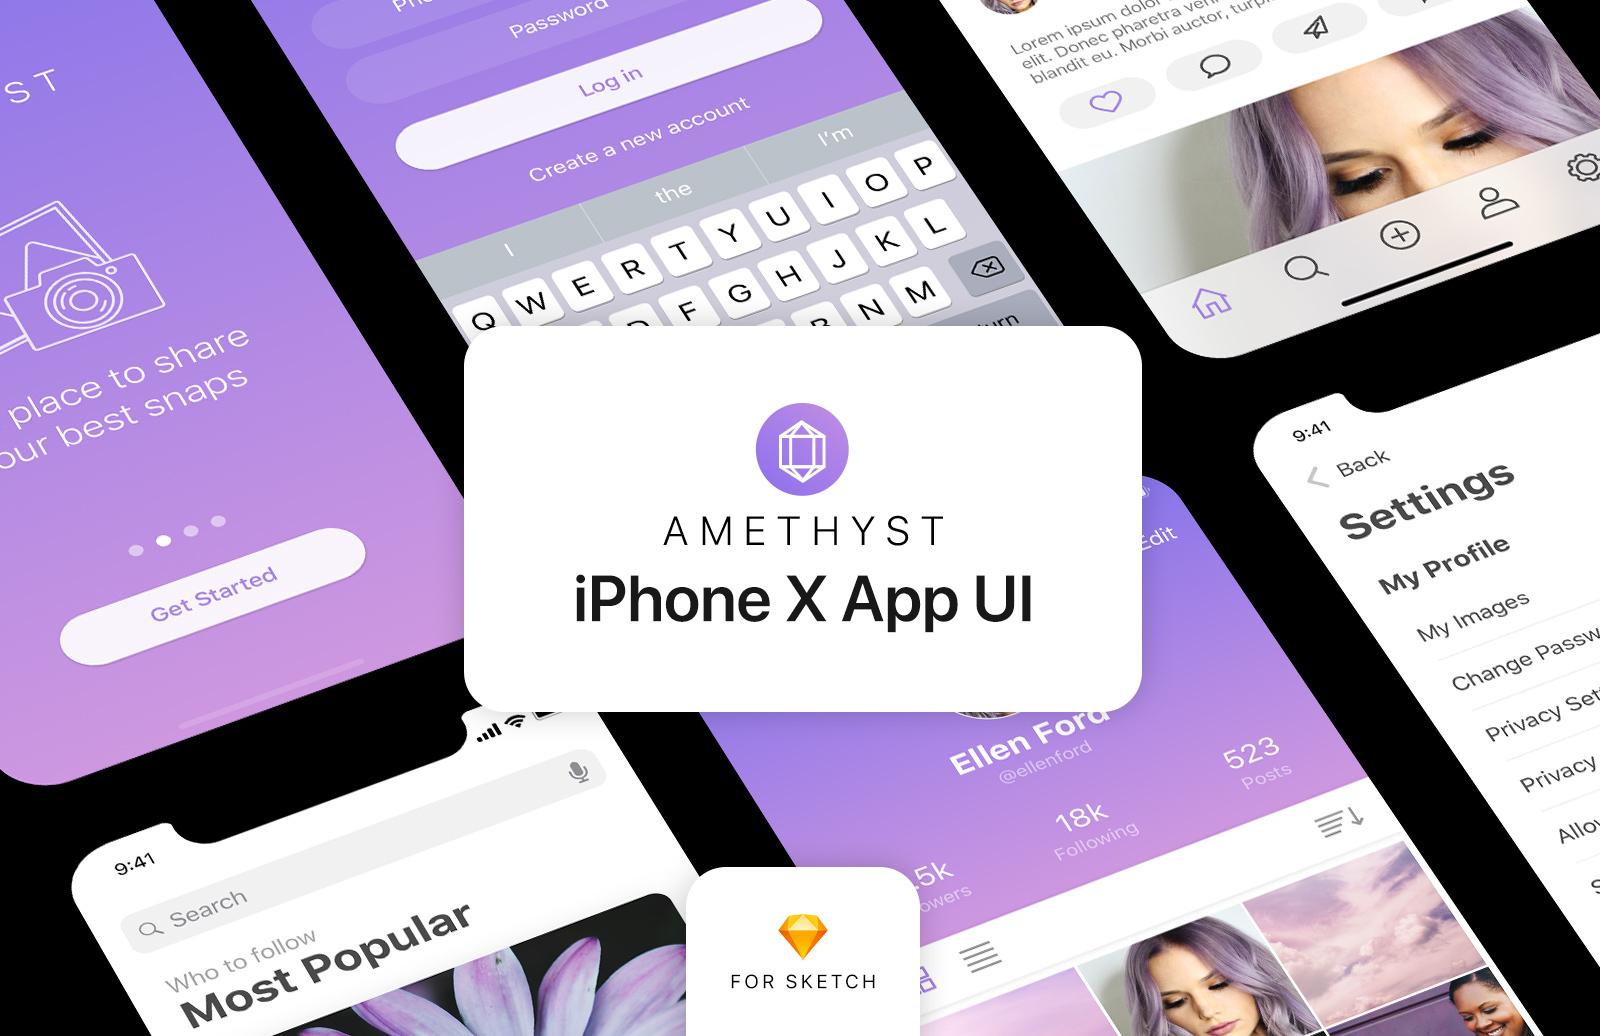 Amethyst: Free iPhone X App UI